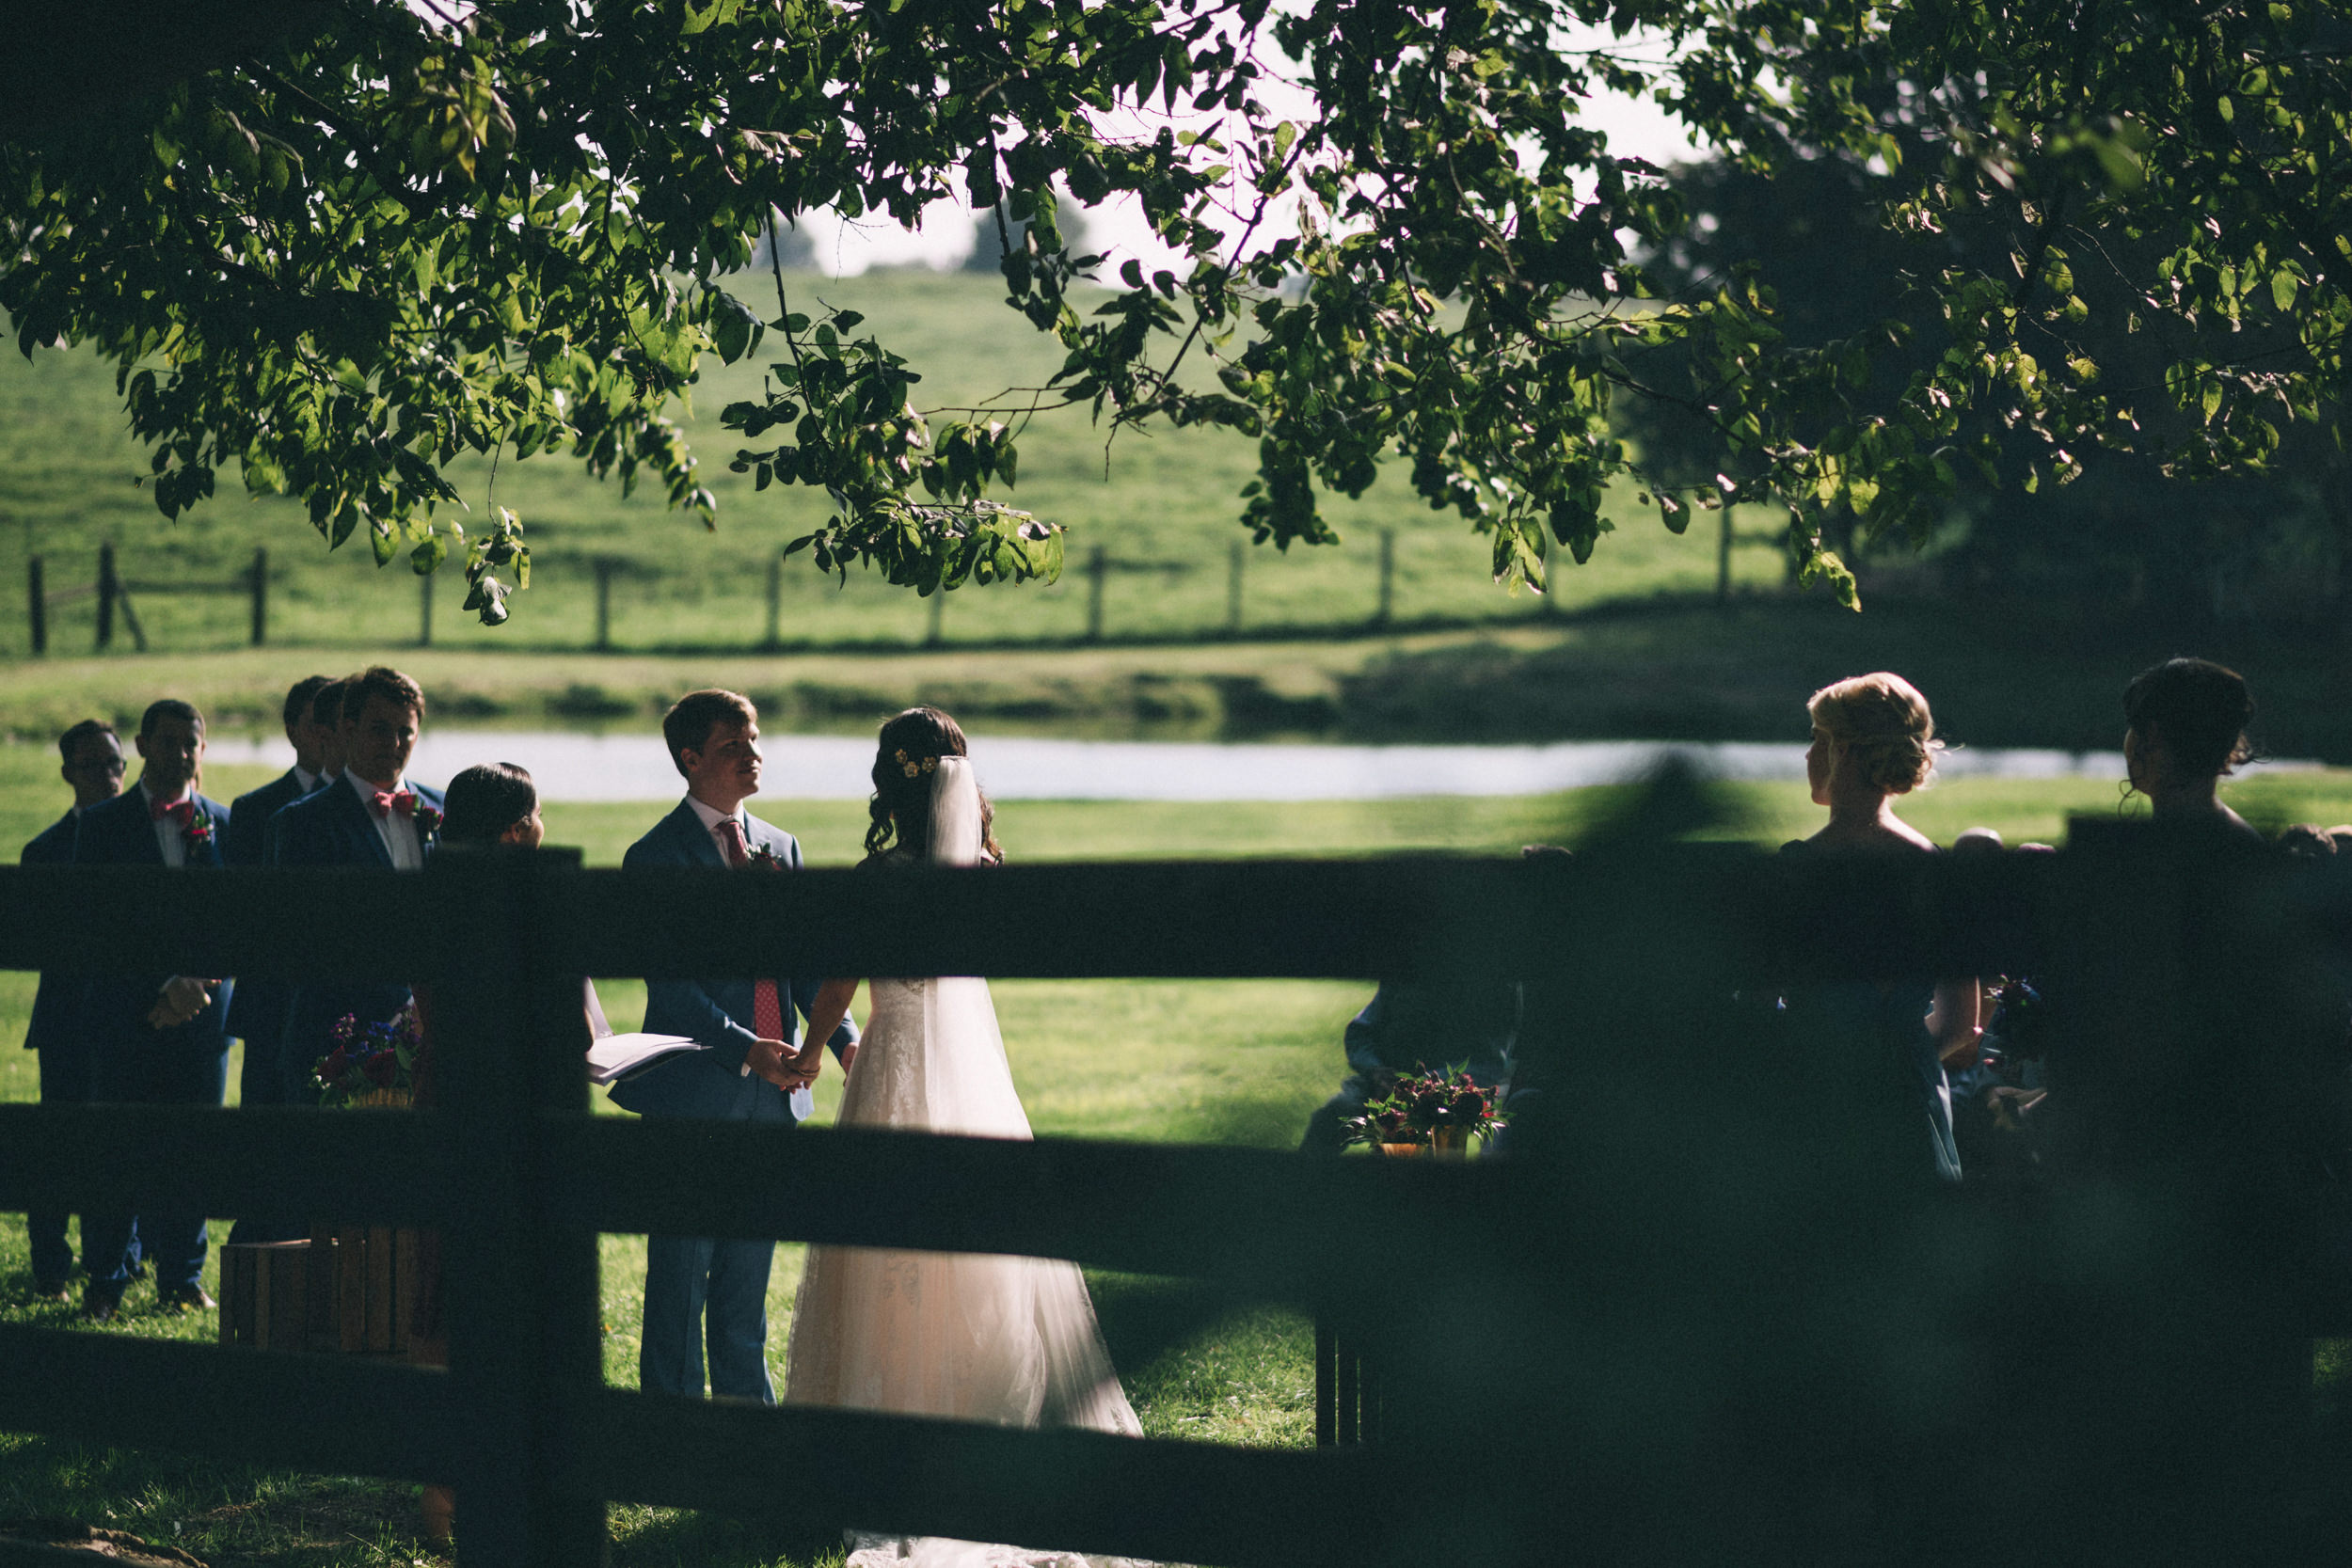 Louisville-Kentucky-Wedding-and-Elopement-Photographer-Sarah-Katherine-Davis-Photography-Summer-Jewel-Toned-Wedding-Chineese-Tea-Ceremony-Warrenwood-Manor-Danville-533.jpg